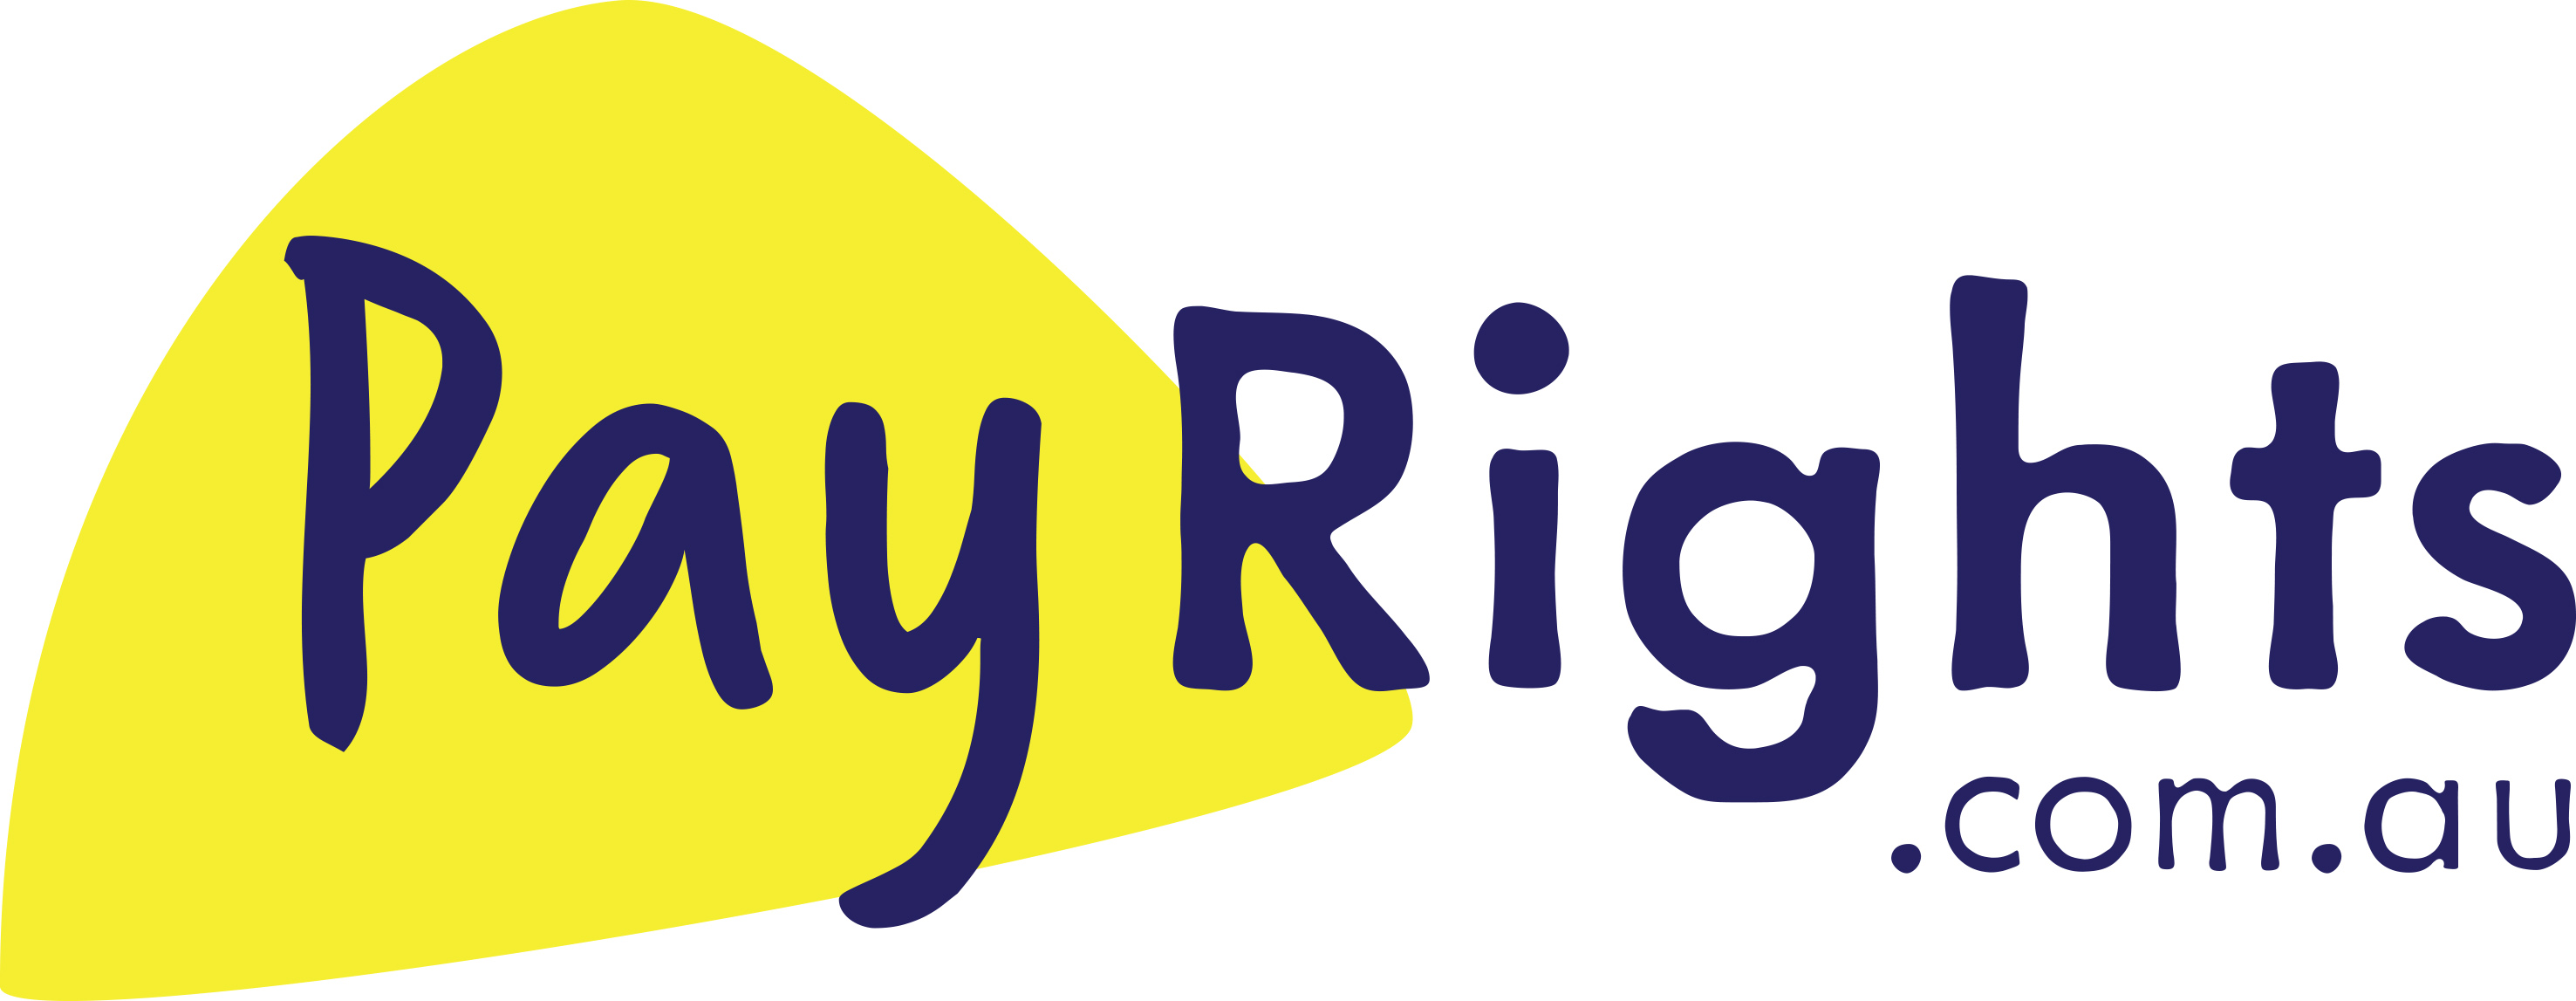 PayRights-Horizontal.jpg